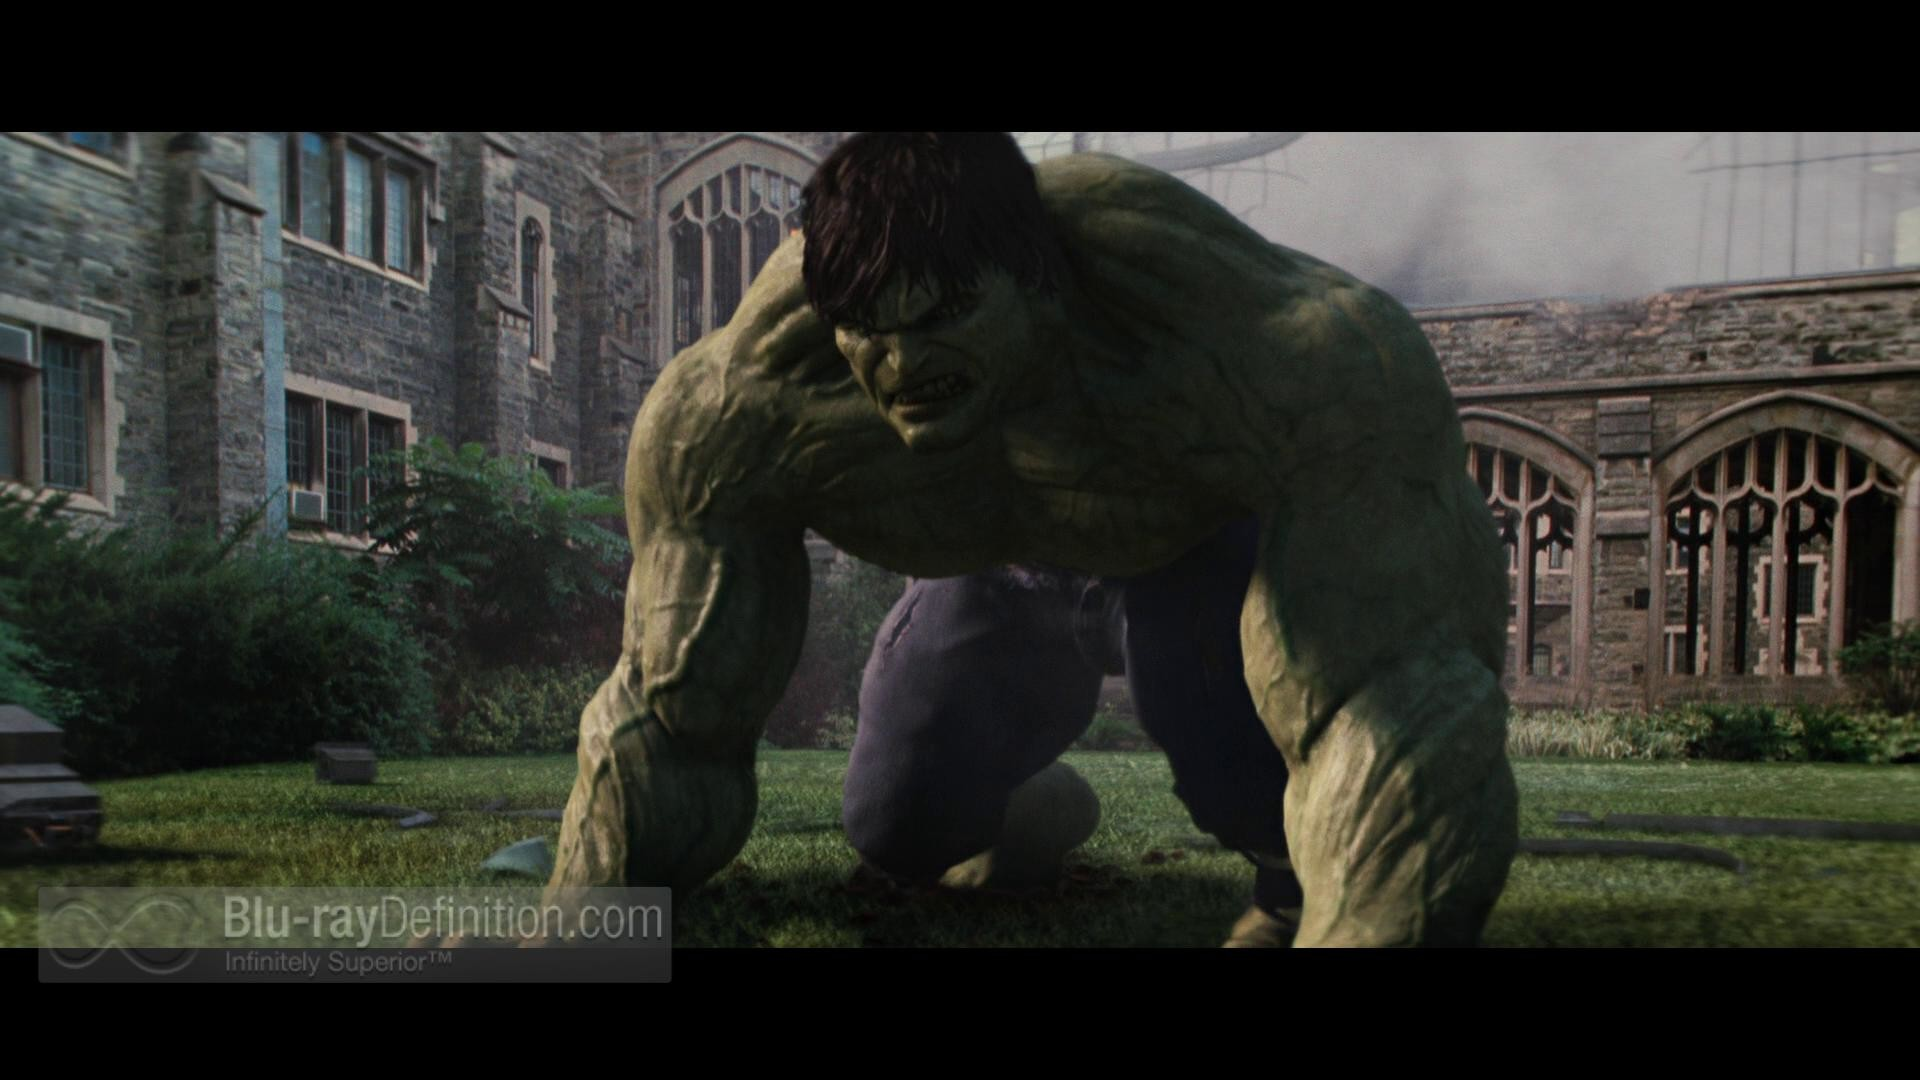 Incredible Hulk Movie Wallpaper Hd – image #779169